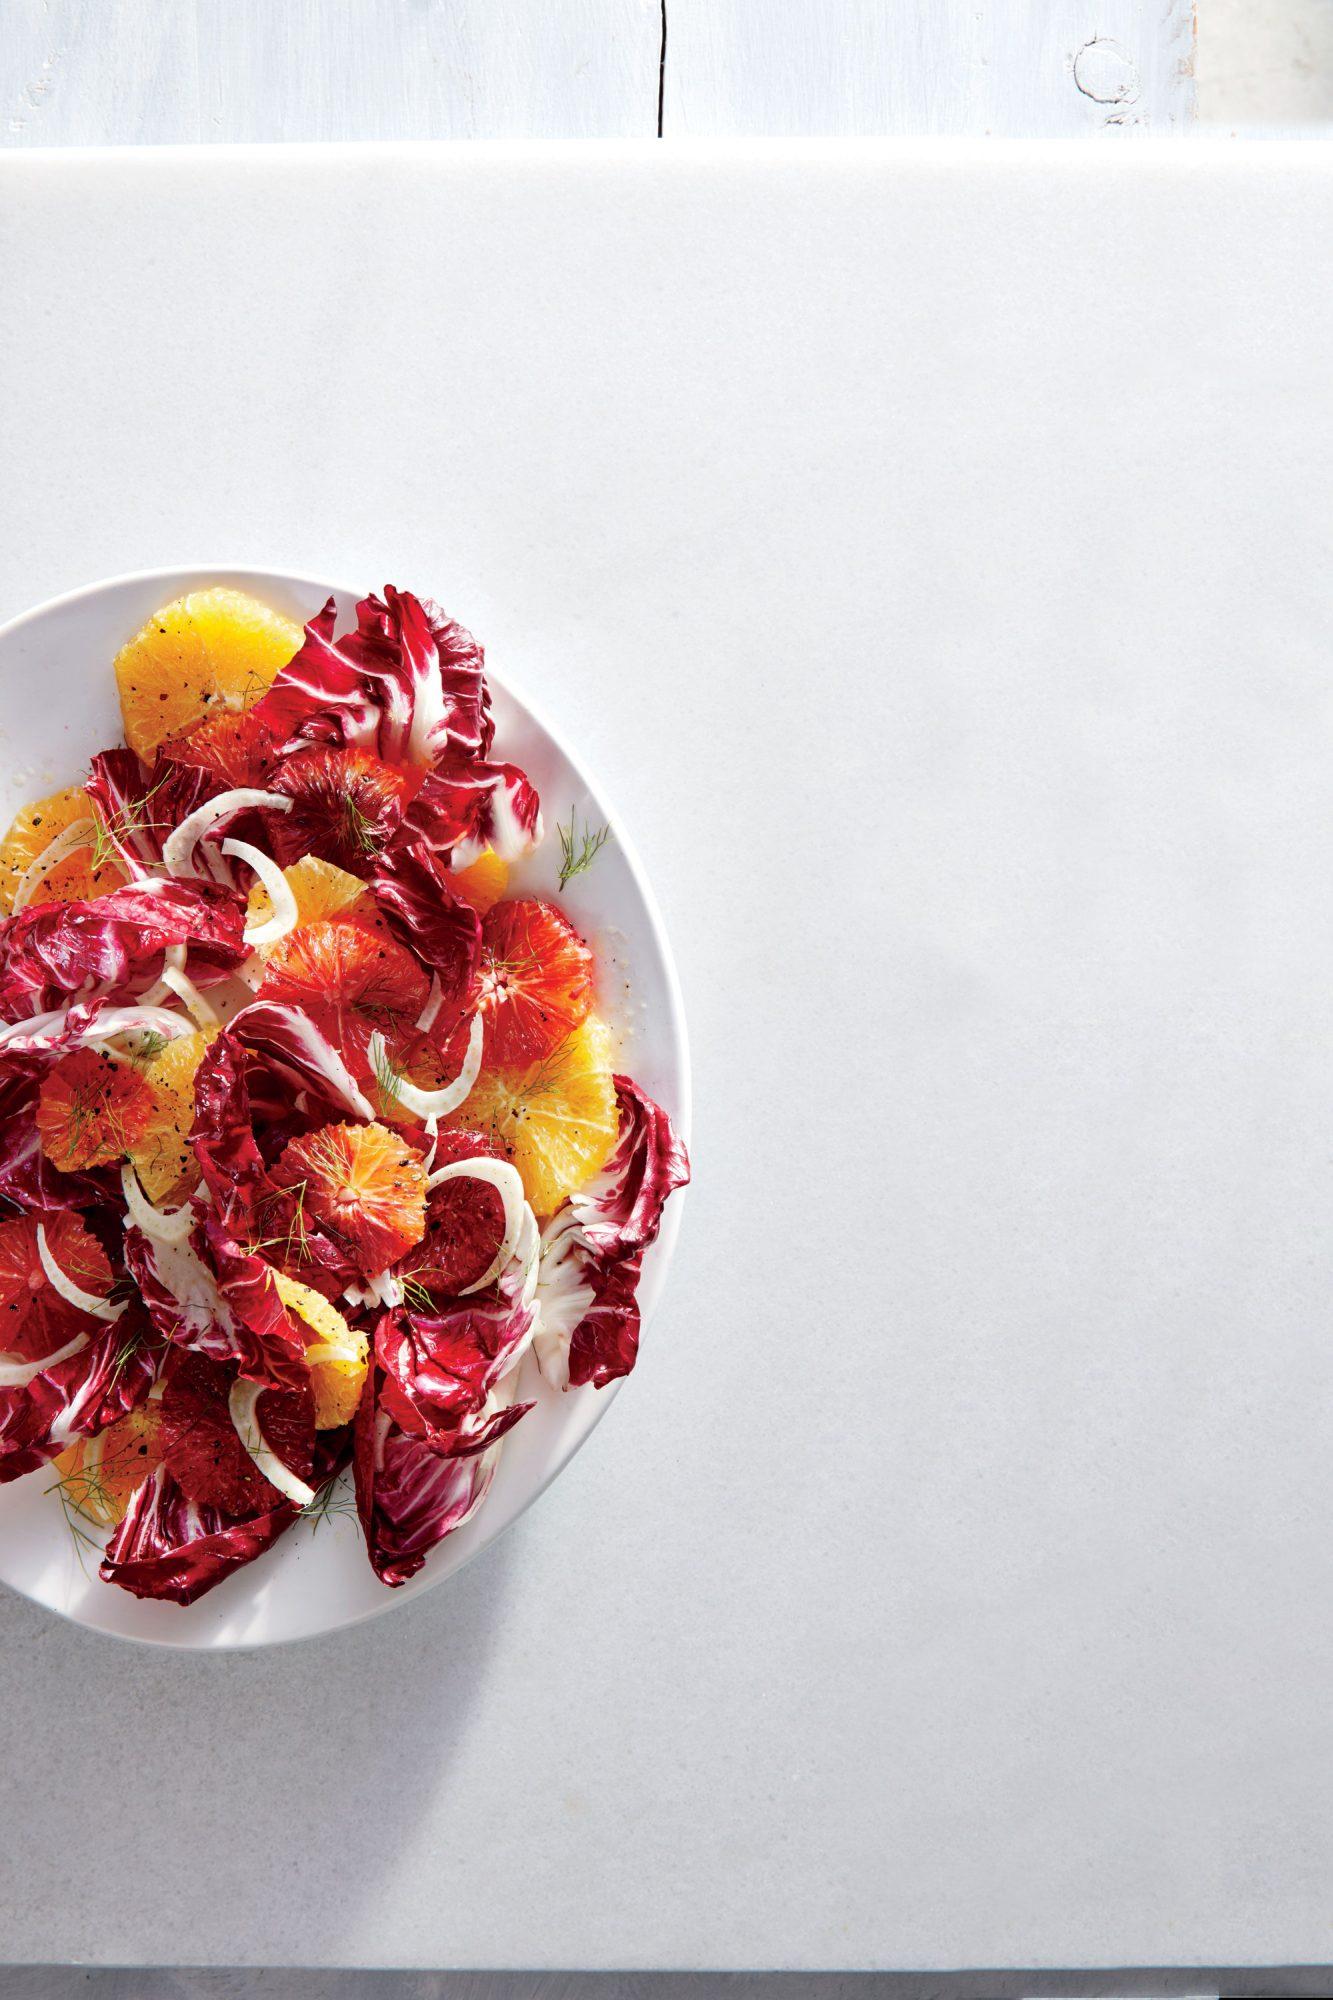 Blood Orange and Radicchio Salad